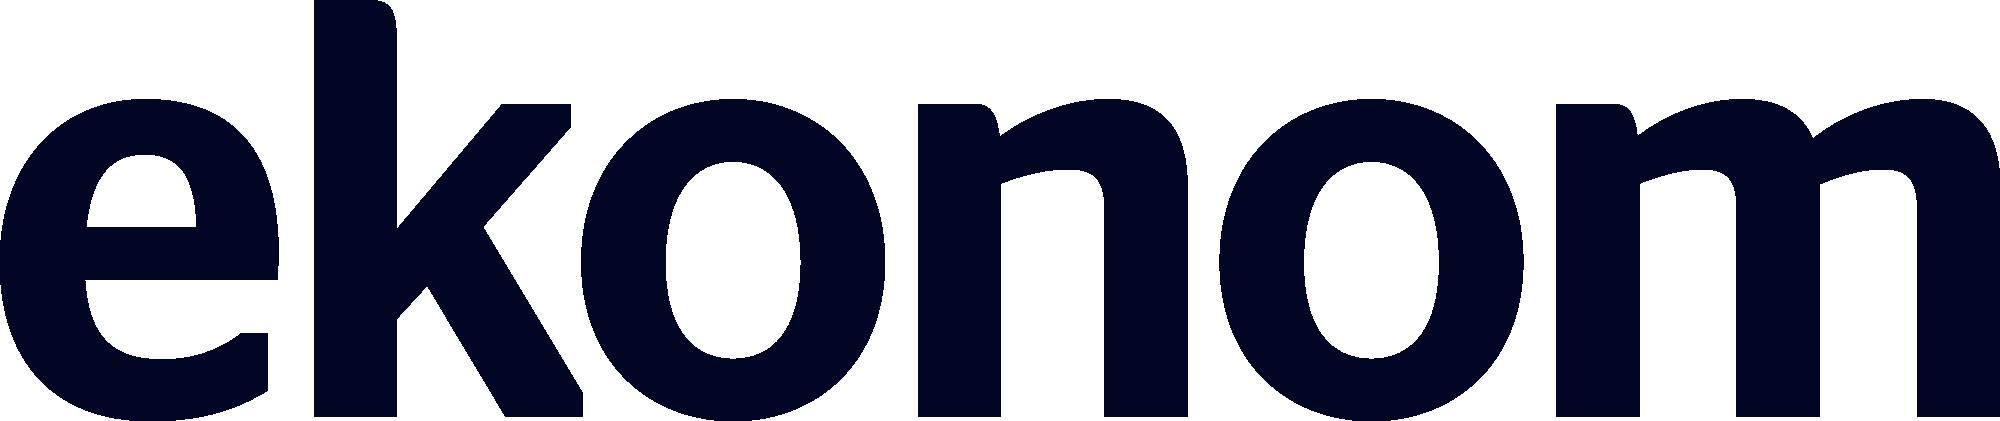 logo ekonom